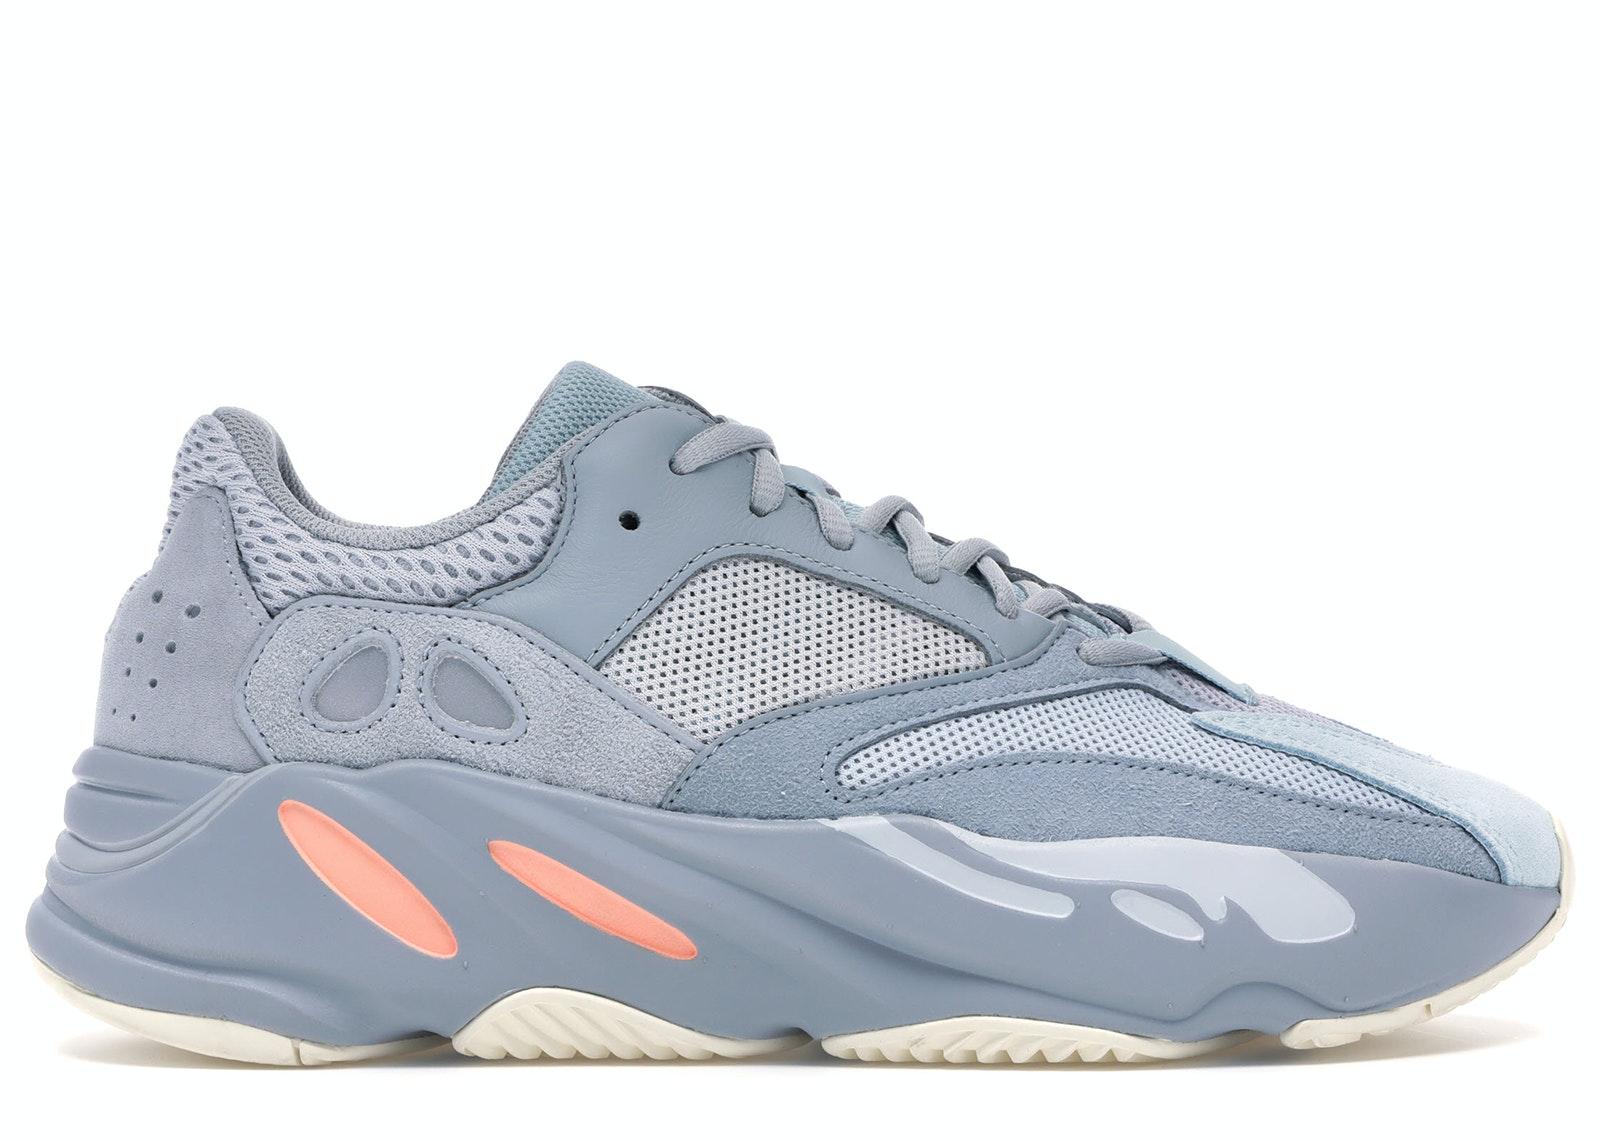 Buy adidas Yeezy Shoes \u0026 Deadstock Sneakers